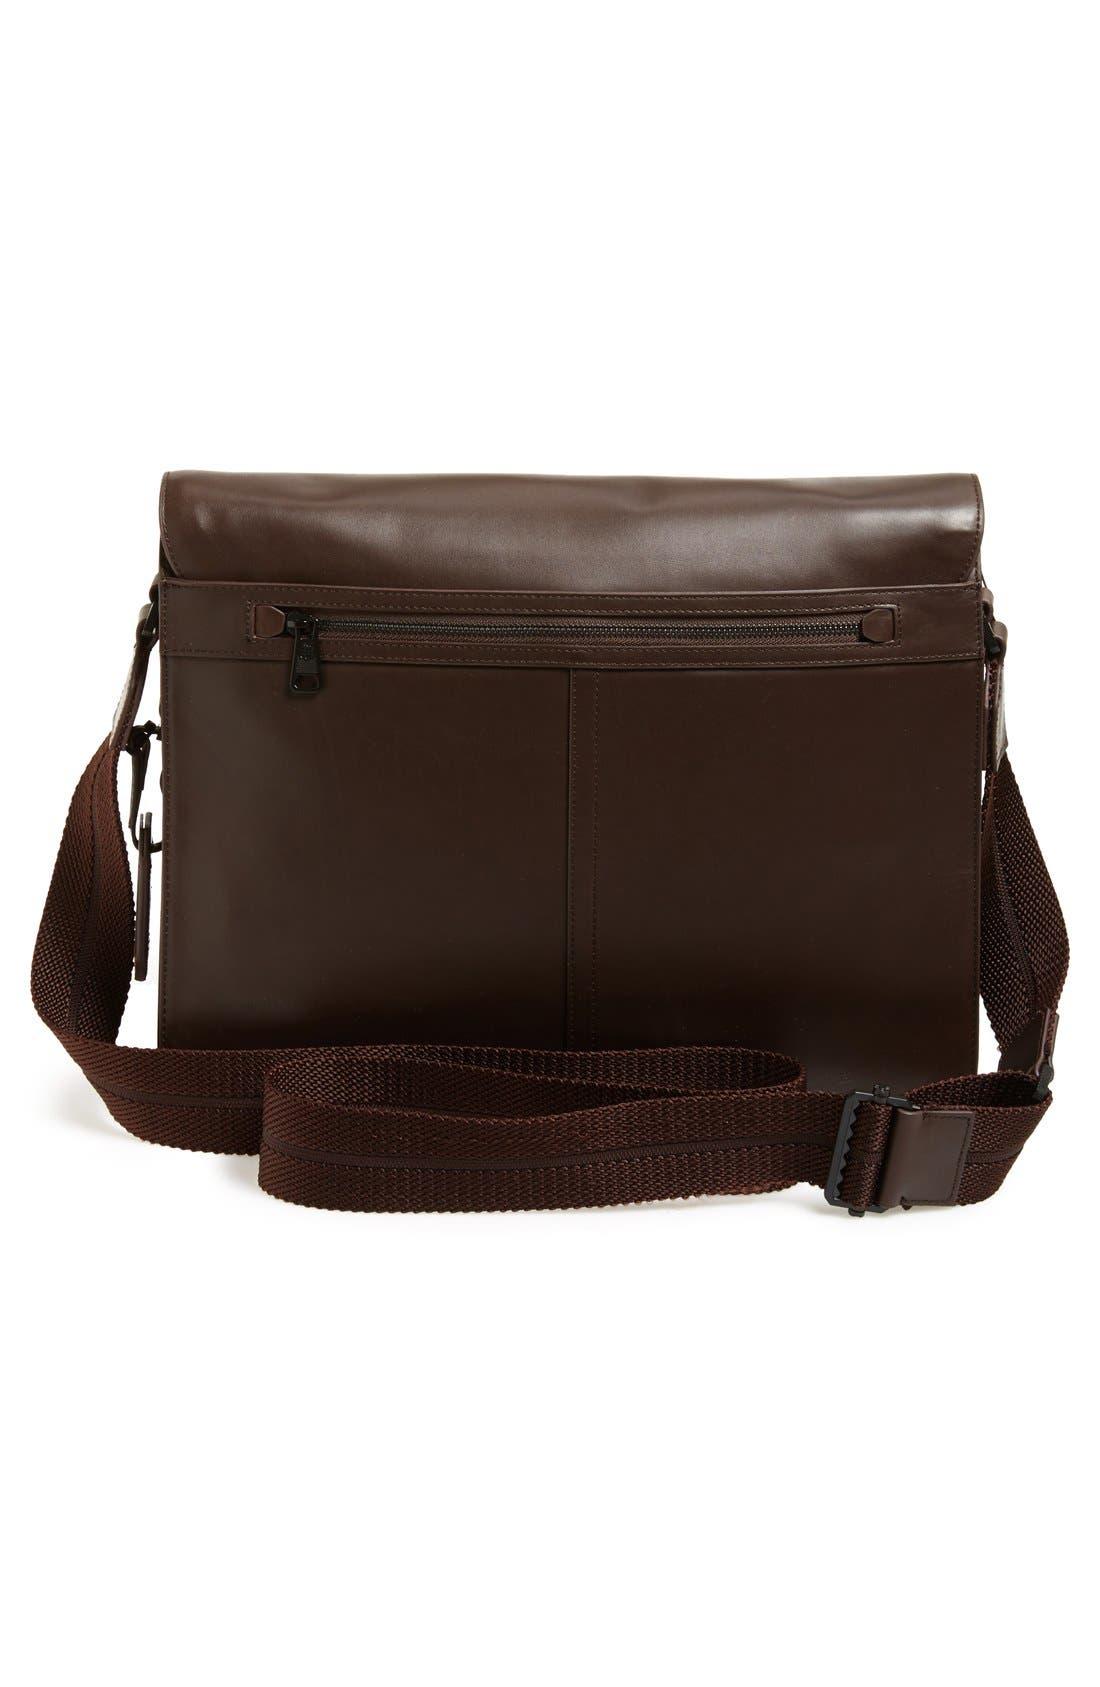 'Tolve' Leather Messenger Bag,                             Alternate thumbnail 3, color,                             210